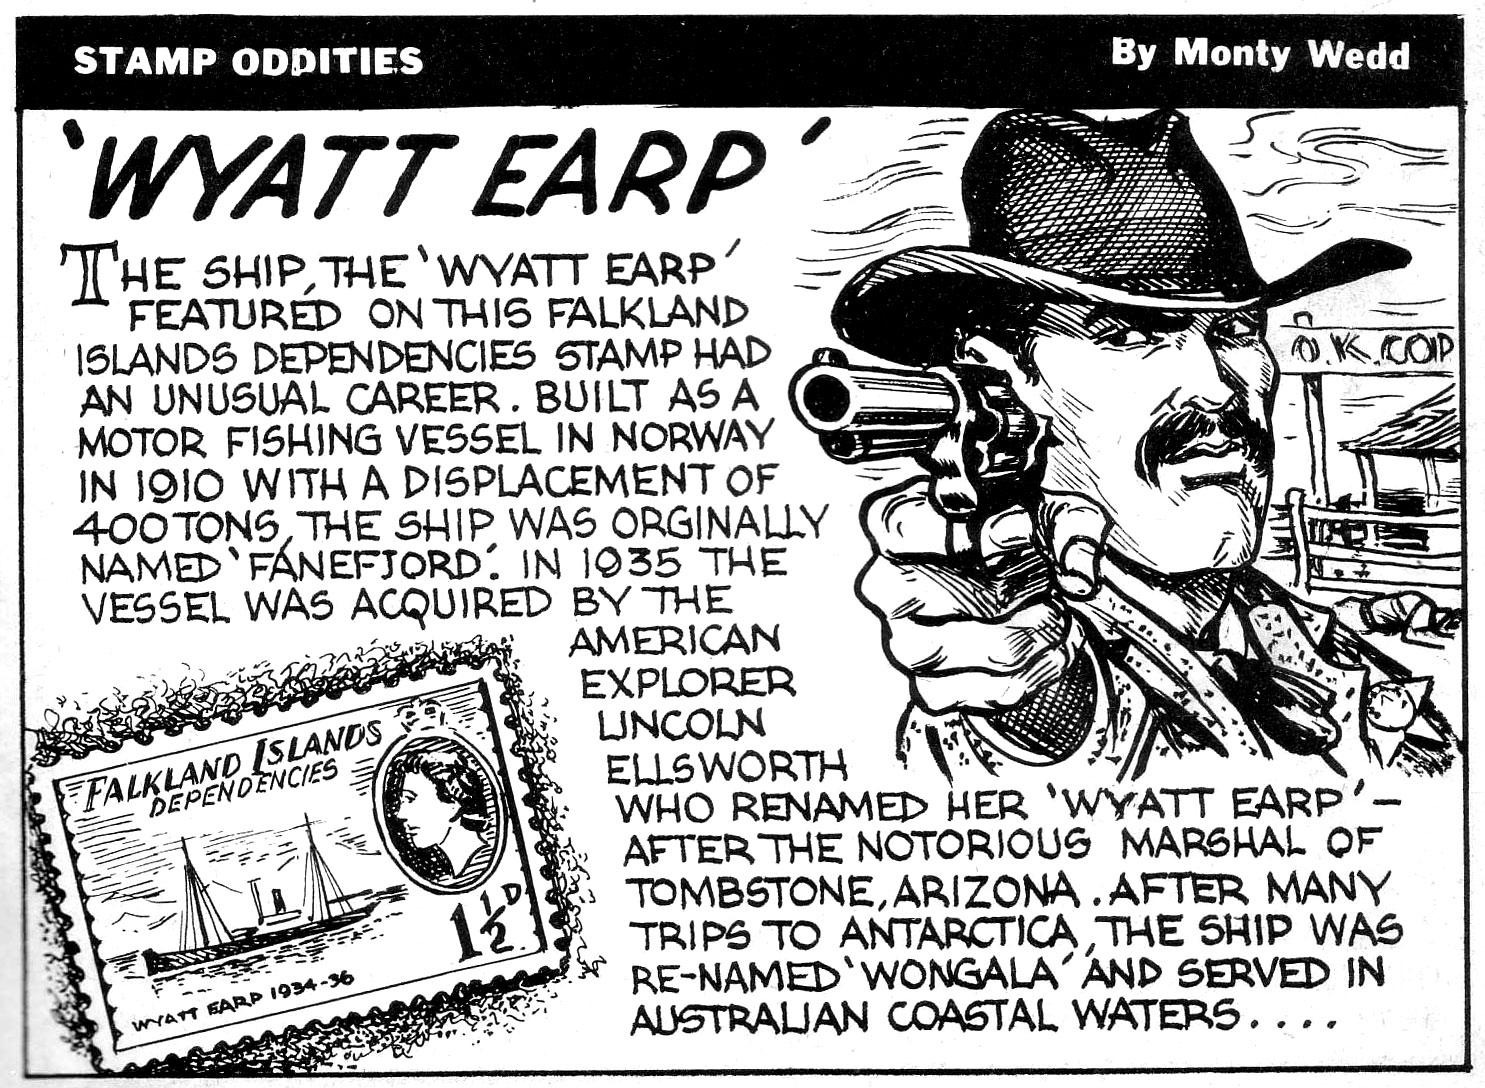 Monty Wedd Stamp Oddity